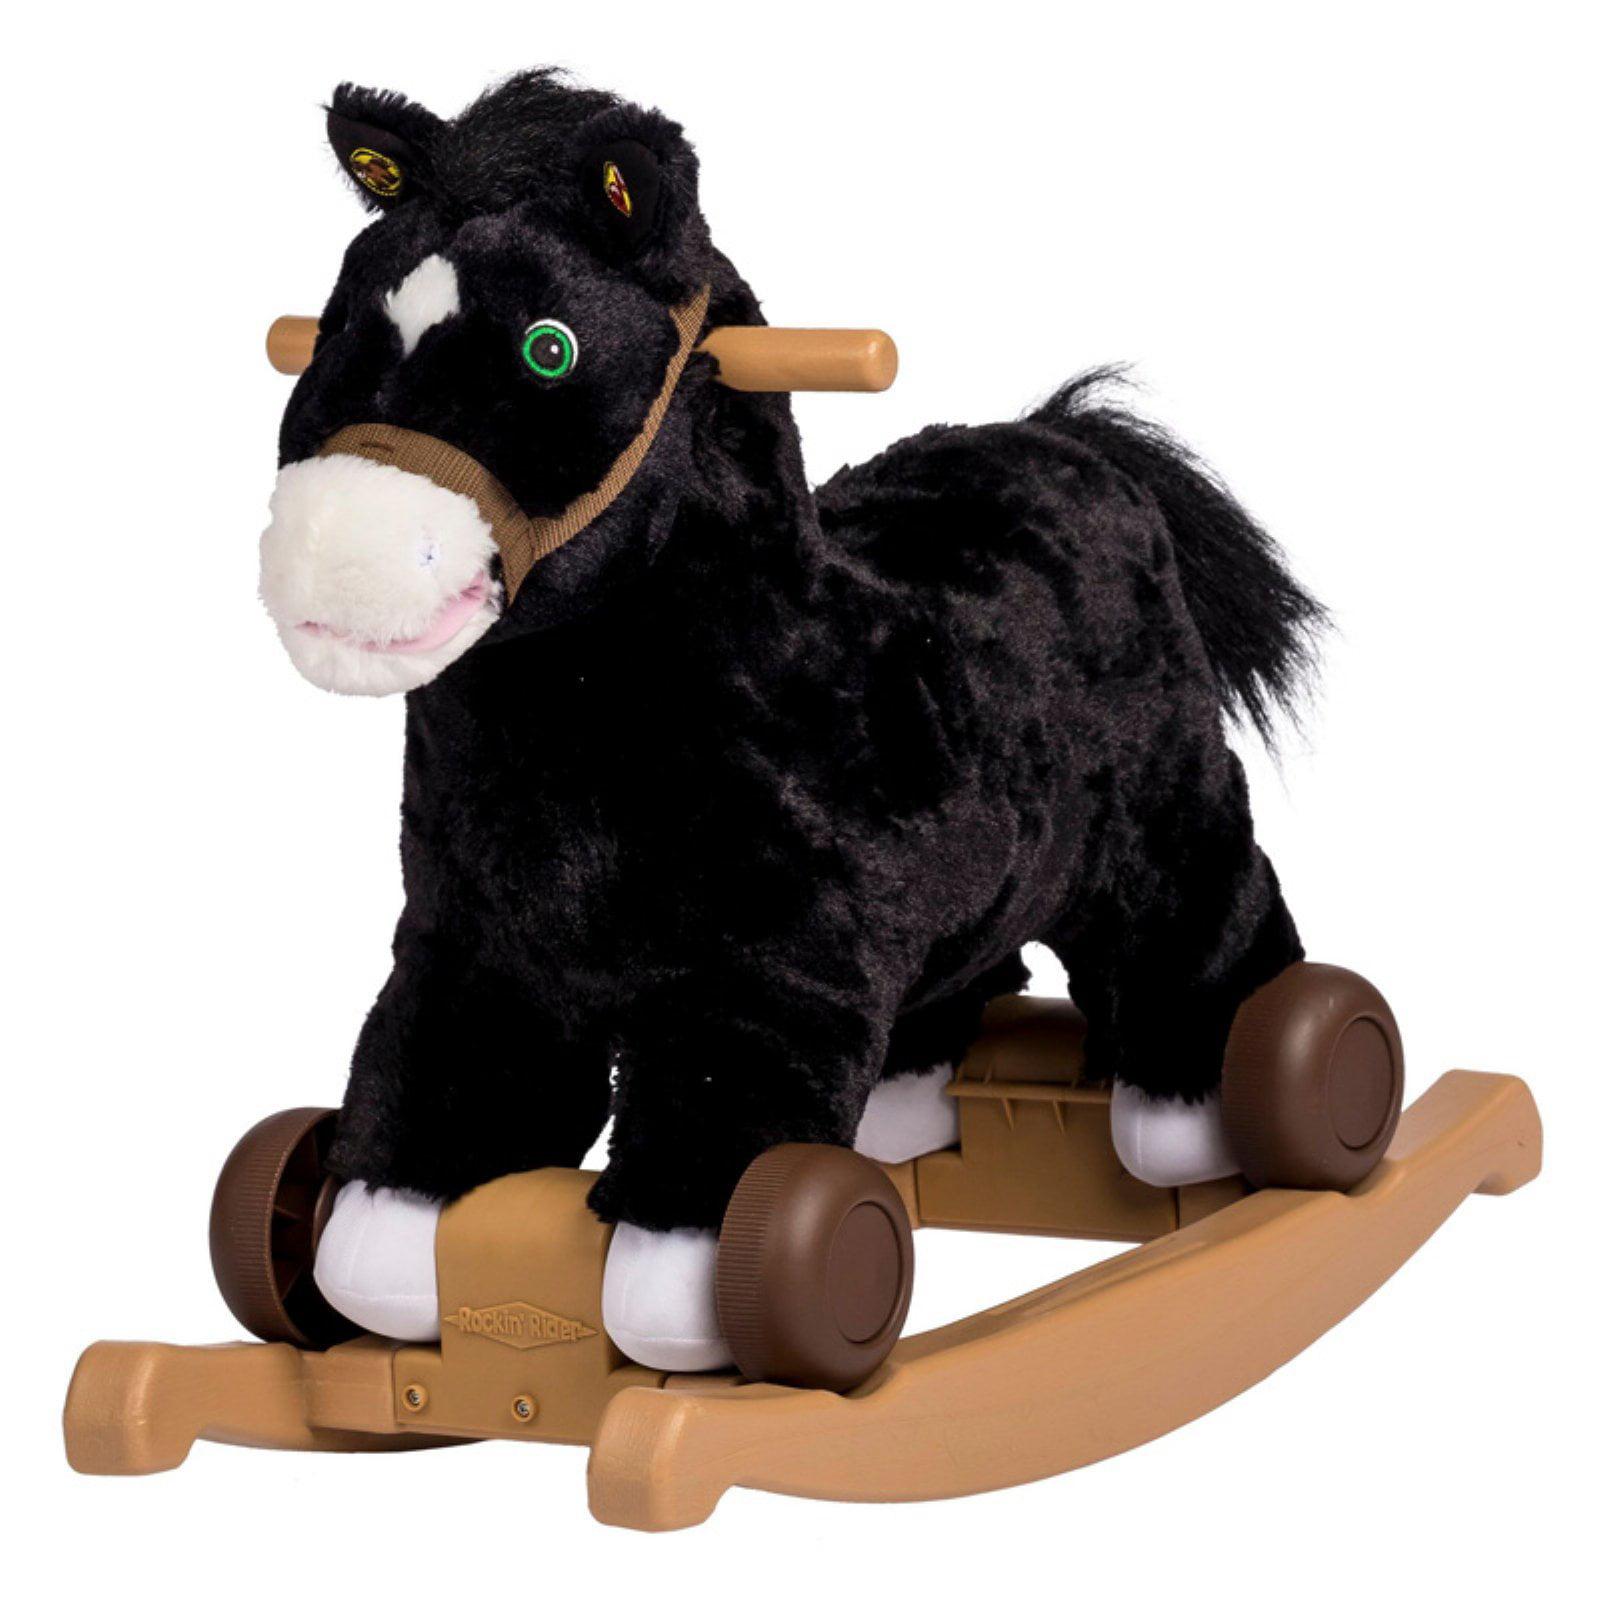 Rockin' Rider Cocoa 2-in-1 Pony